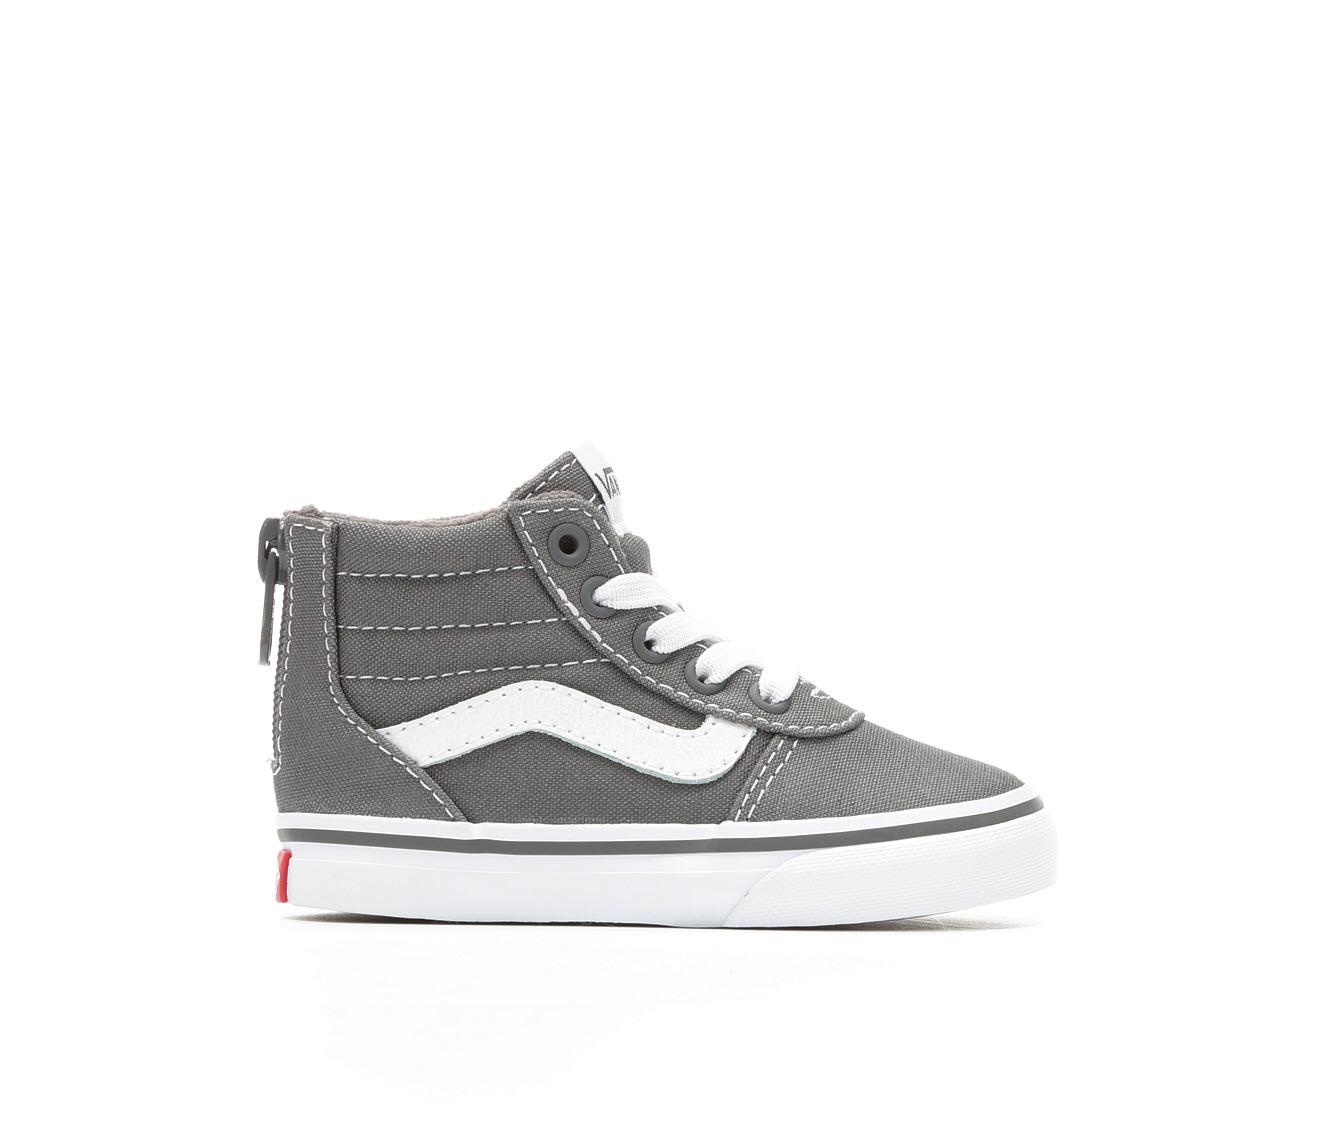 Girls' Vans Infants Ward Hi Zip Skate Shoes (Grey)